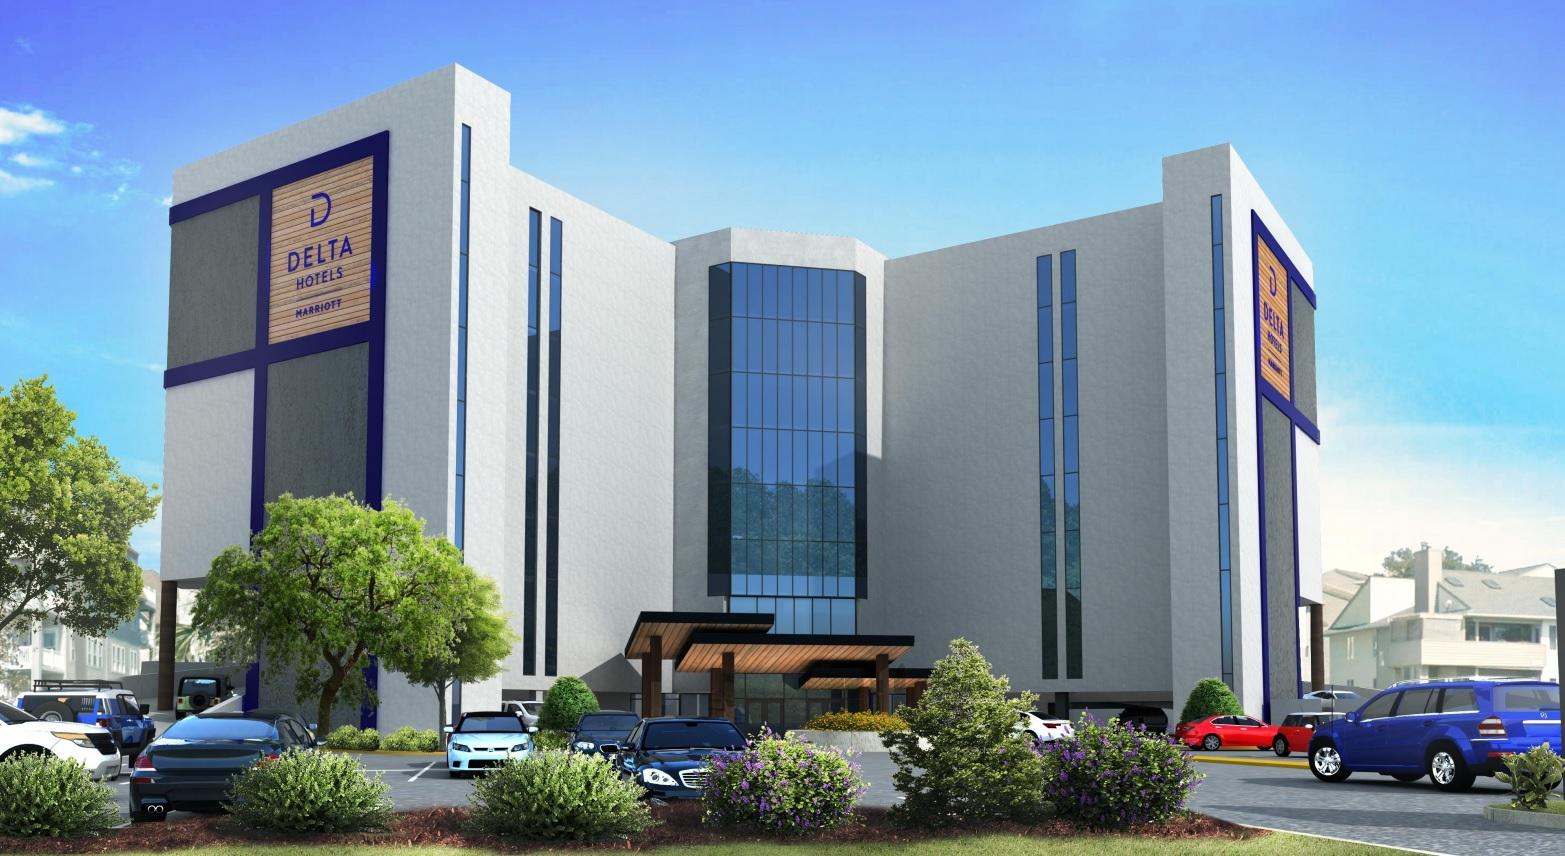 New Virginia Beach Resort Hotel & Conference Center rendering_1526428827180.jpg.jpg